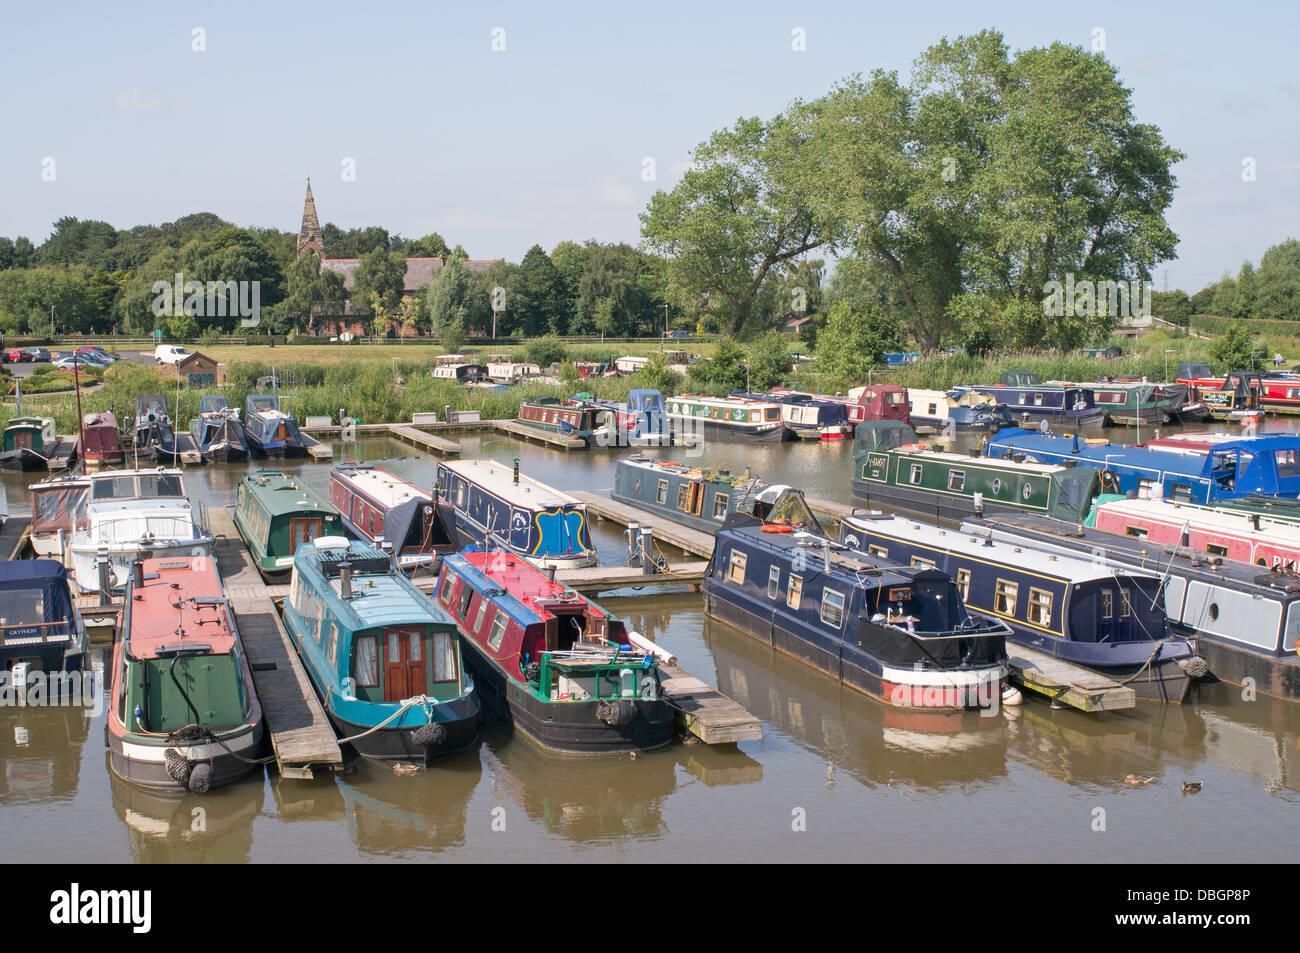 Canal narrow boats moored at St Mary's Marina, Rufford, north west England, UK - Stock Image